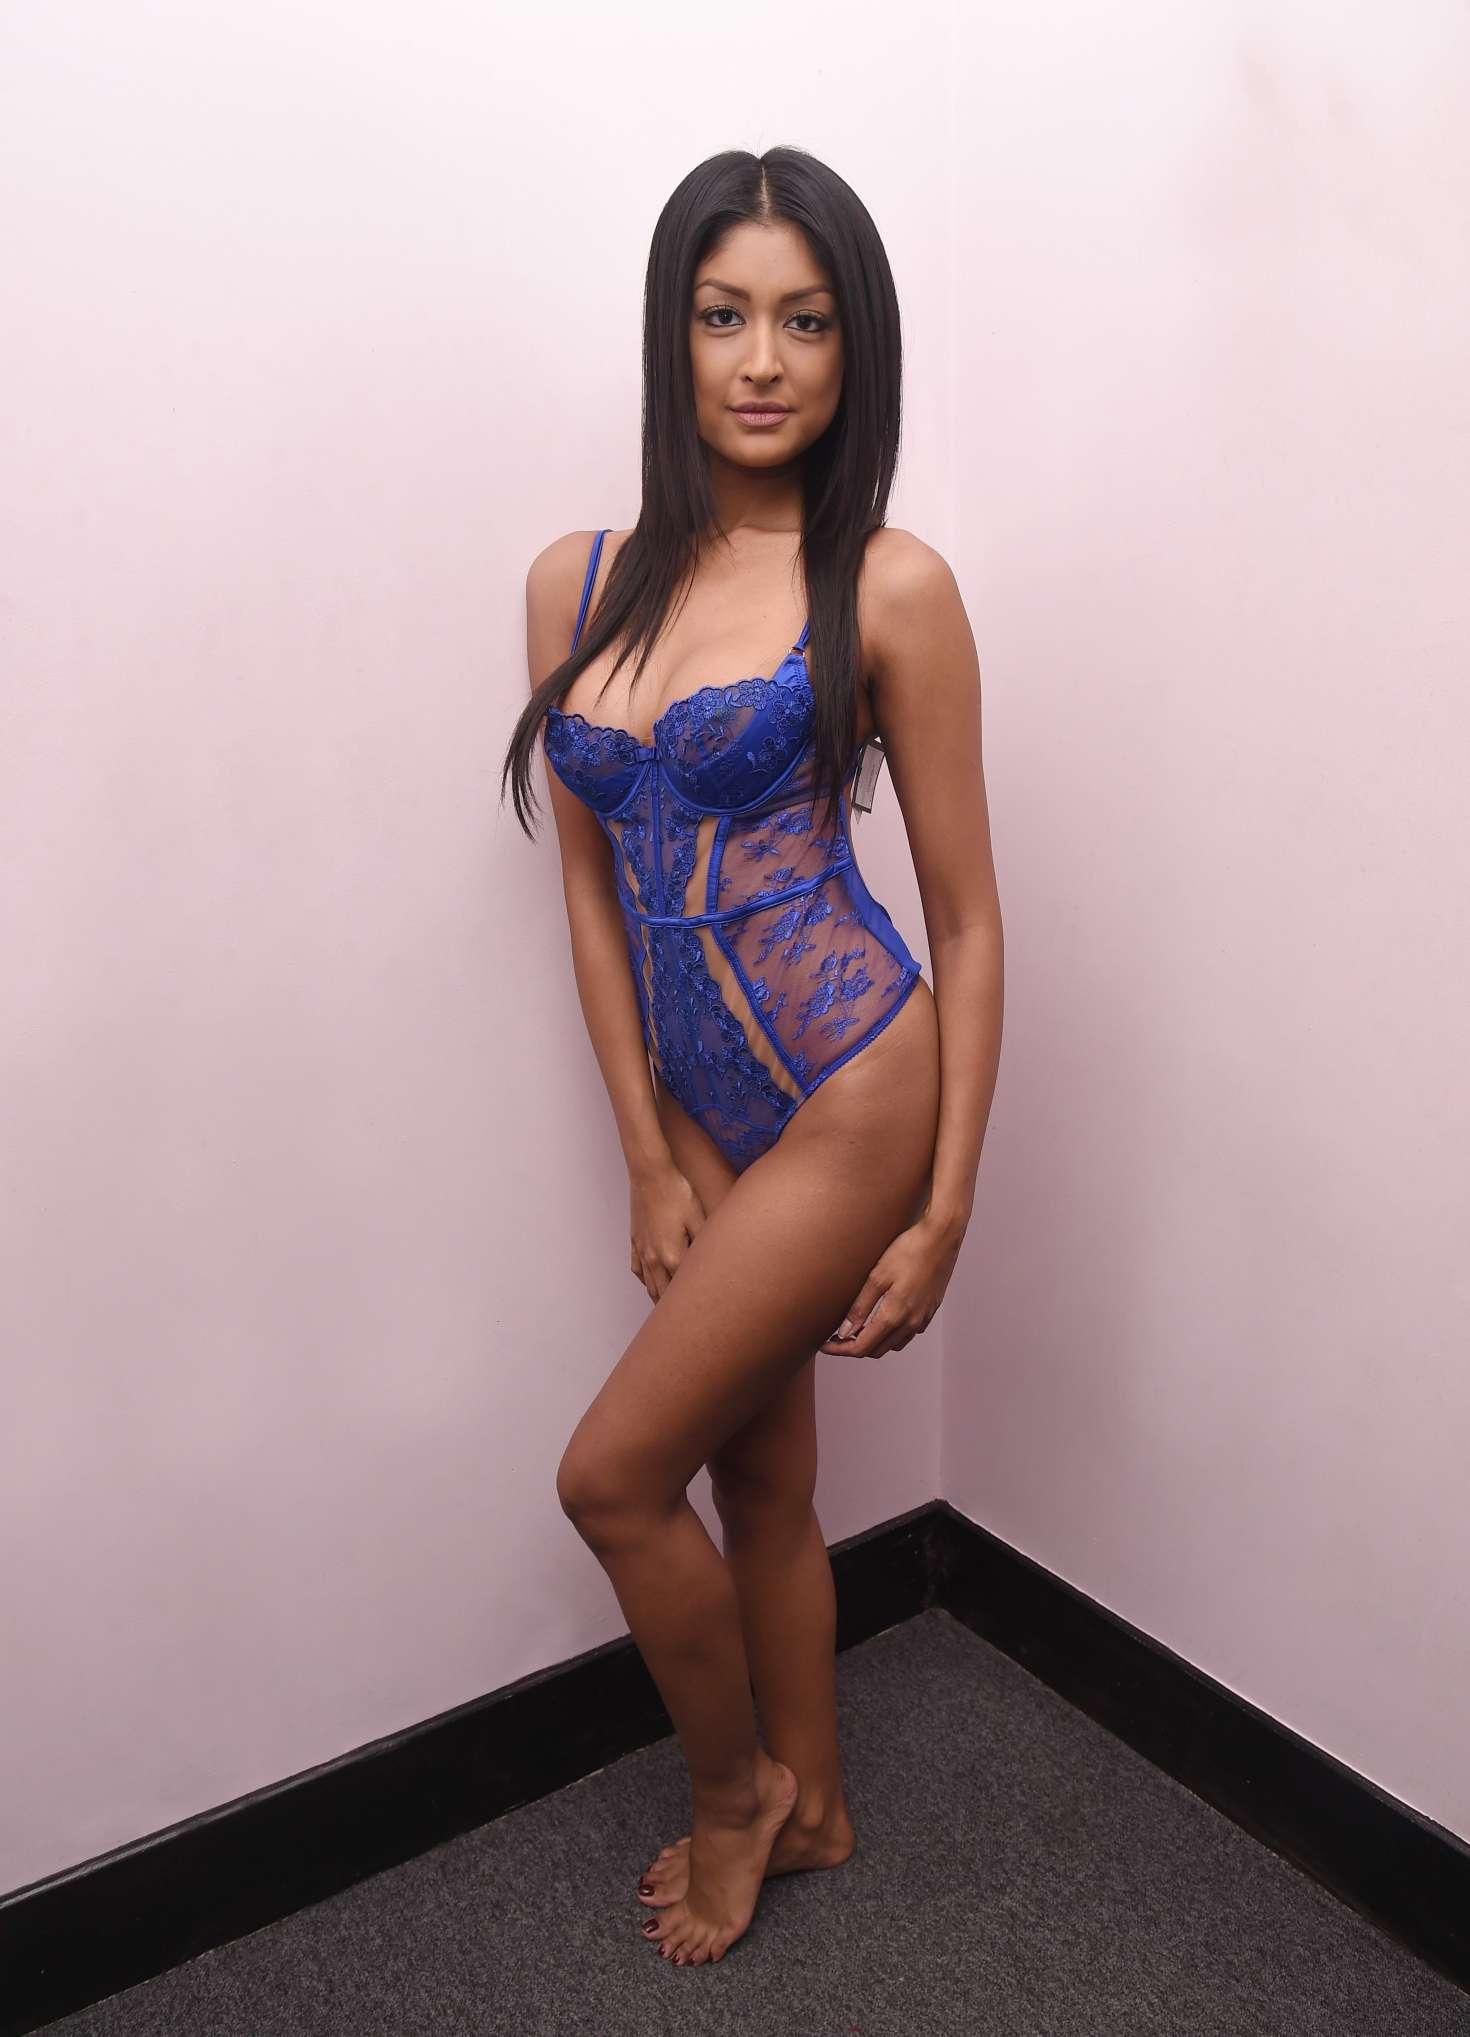 Pictures Farah Sattaur naked (85 photos), Topless, Sideboobs, Instagram, cleavage 2006